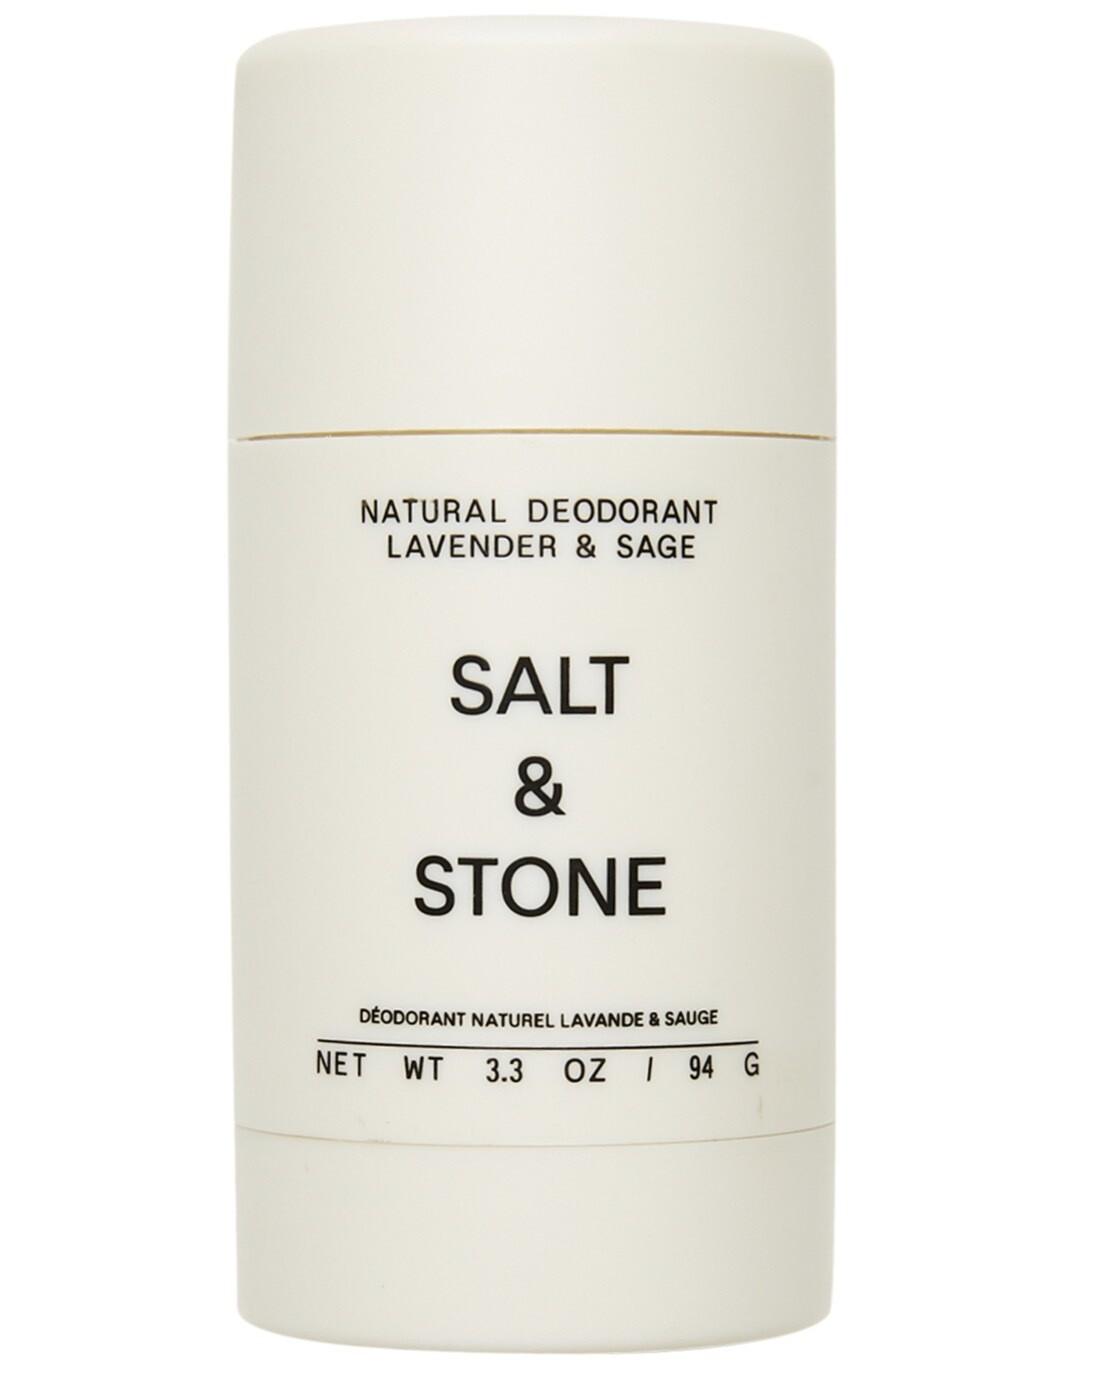 Salt And Stone Deodorant - Lavender & Sage